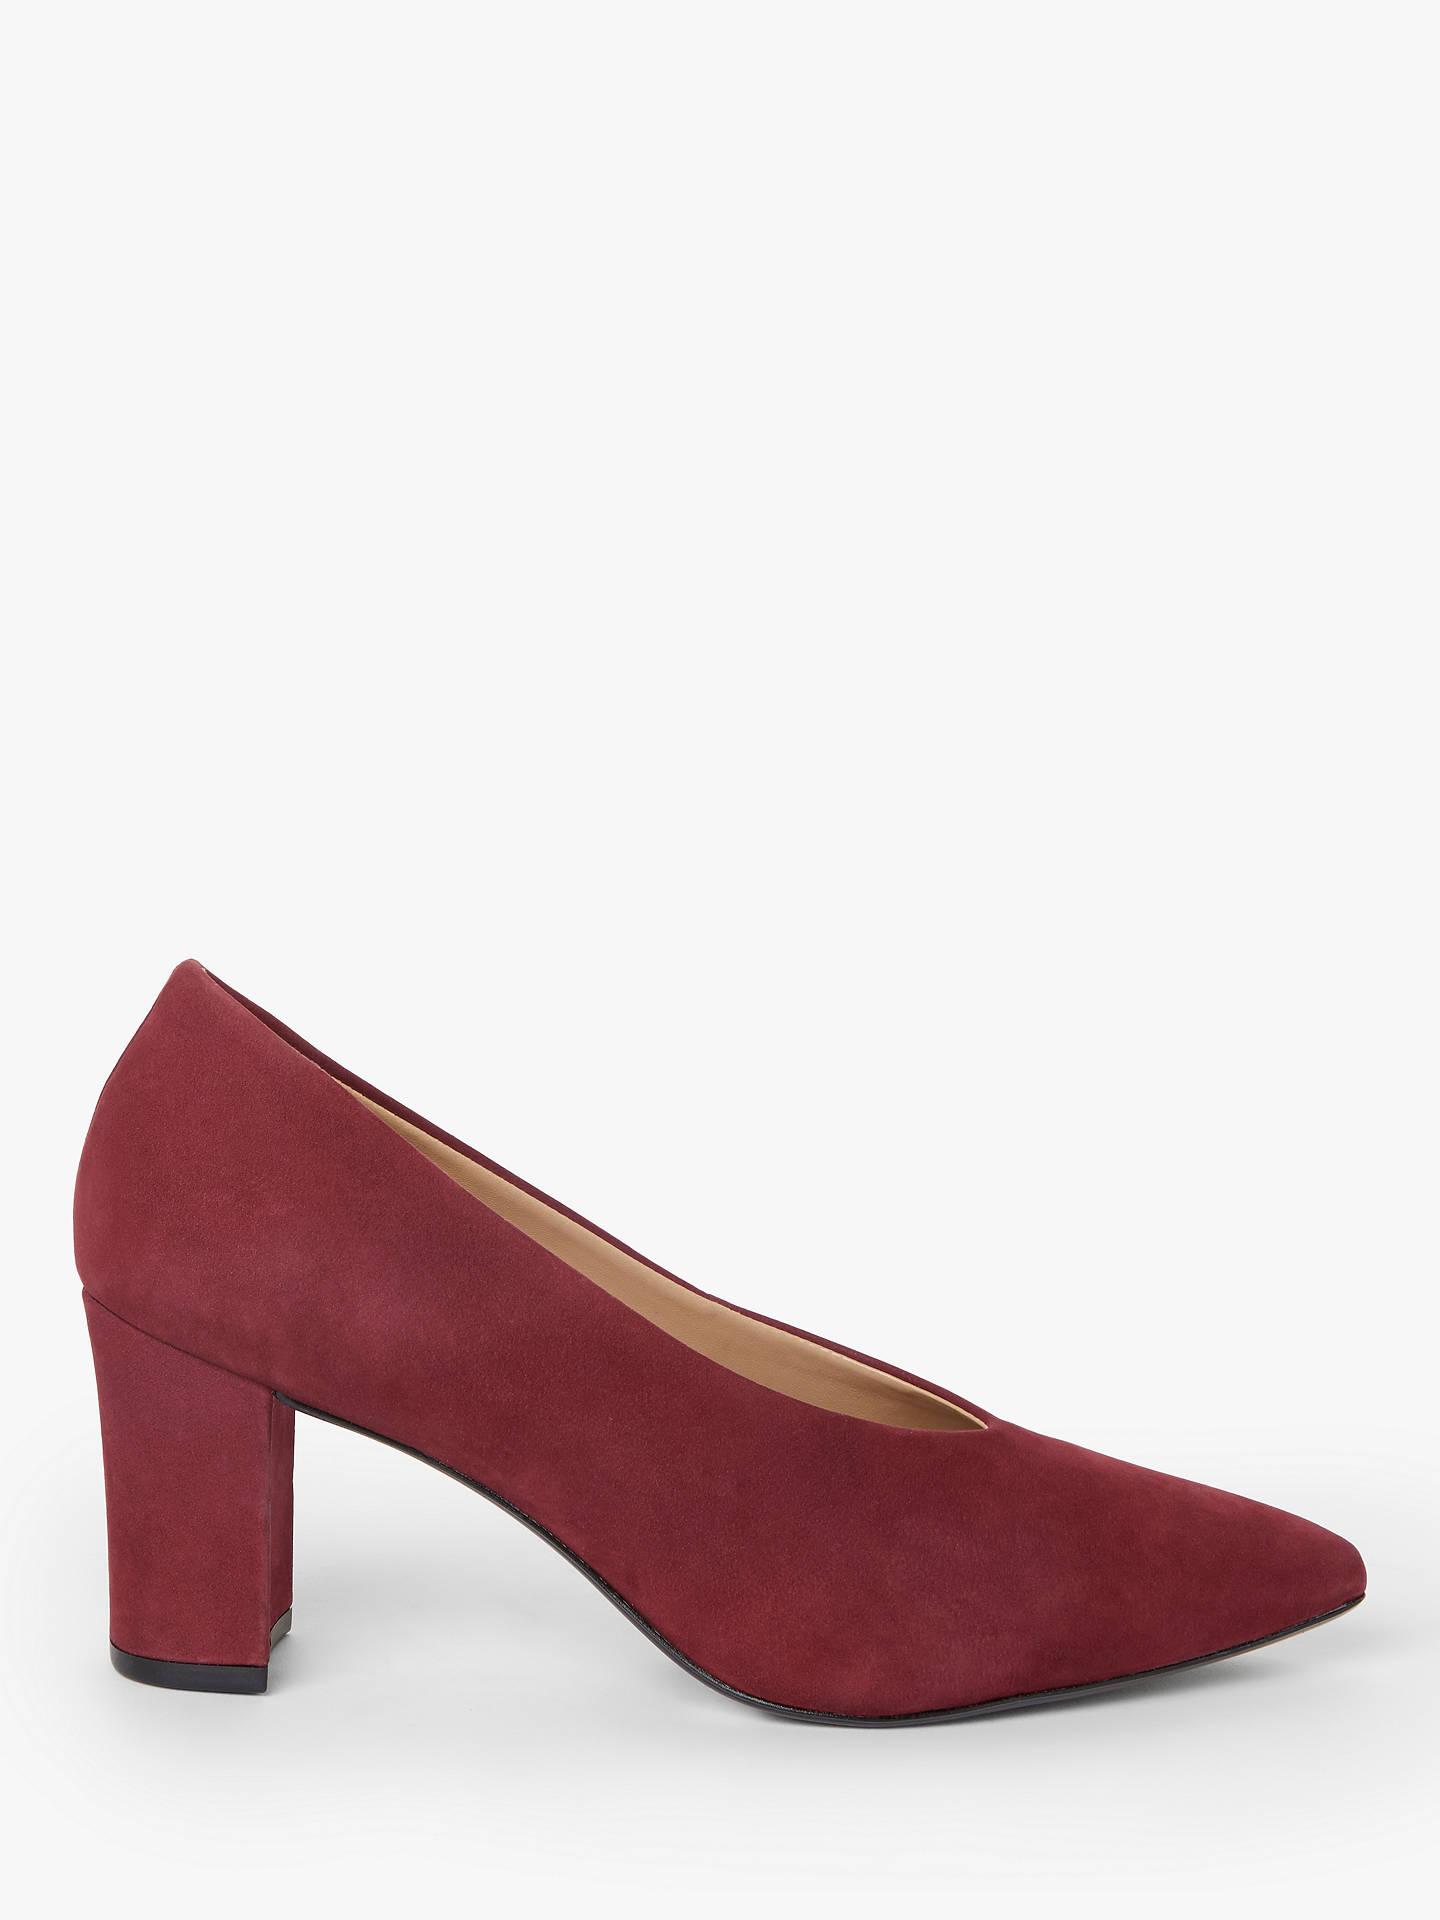 28d3793d87b John Lewis & Partners Alannah Suede Court Shoes, Dark Red